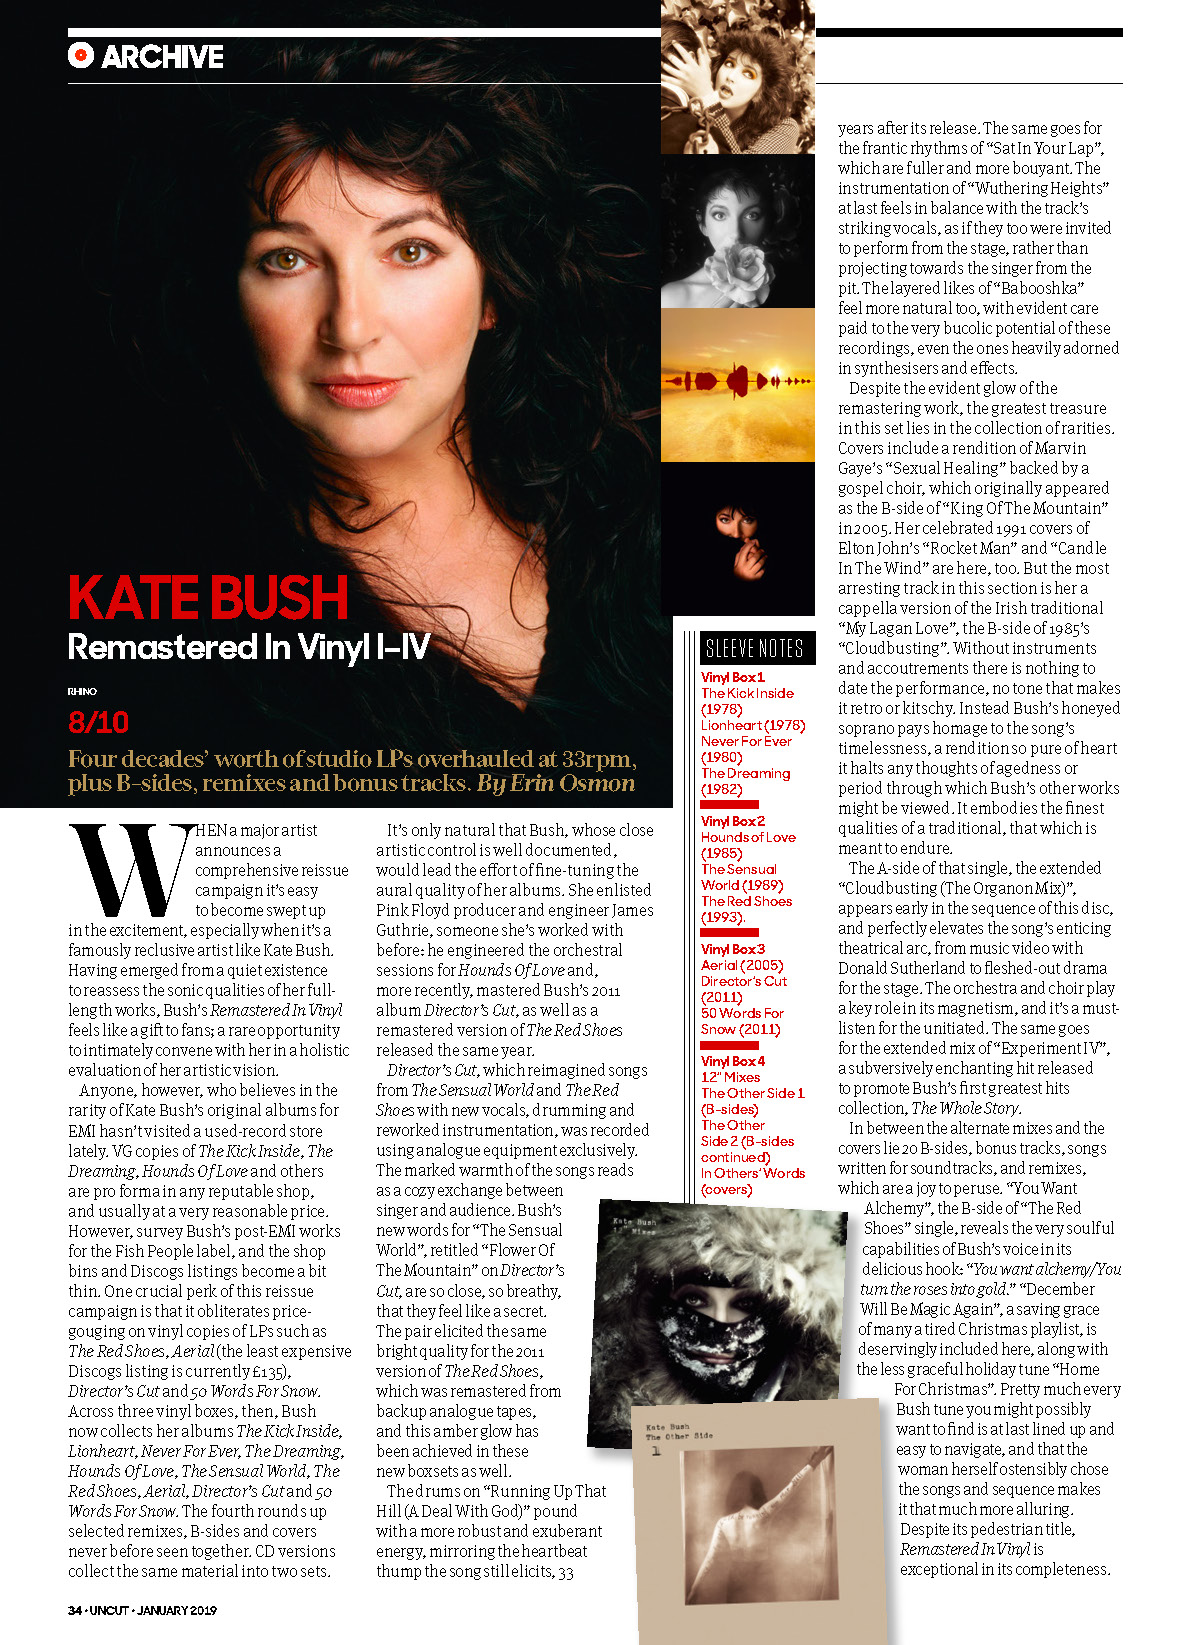 Kate Bush  Remastered In Vinyl I-IV